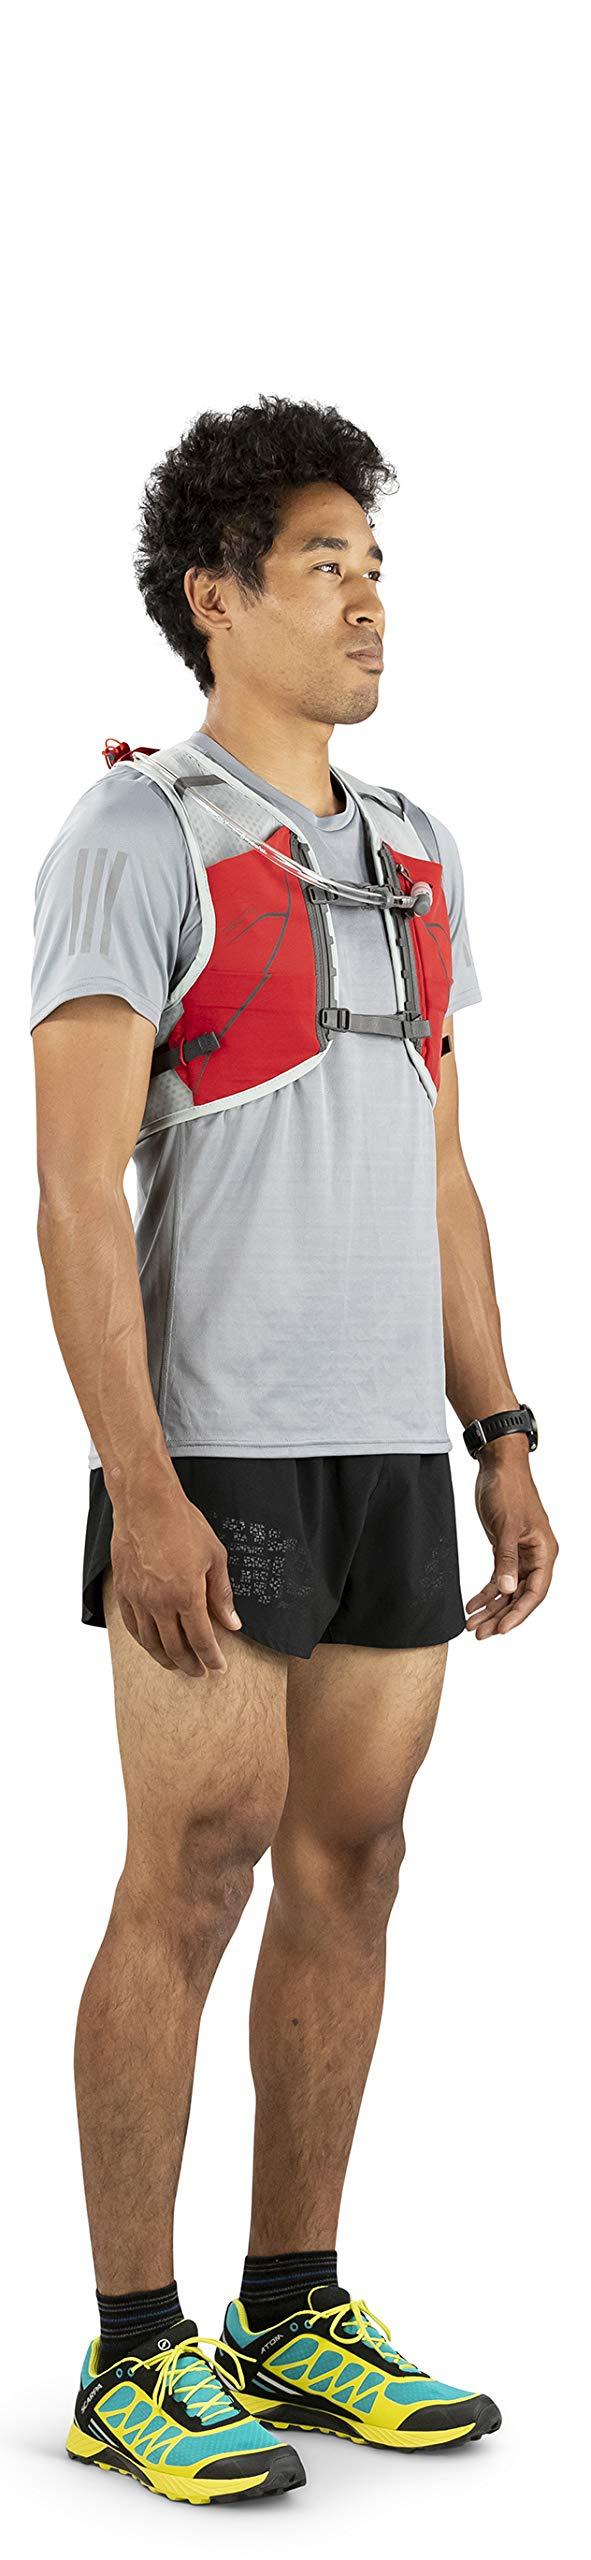 Osprey Packs Duro 6 Running Hydration Vest, Phoenix Red, Small/Medium by Osprey (Image #3)